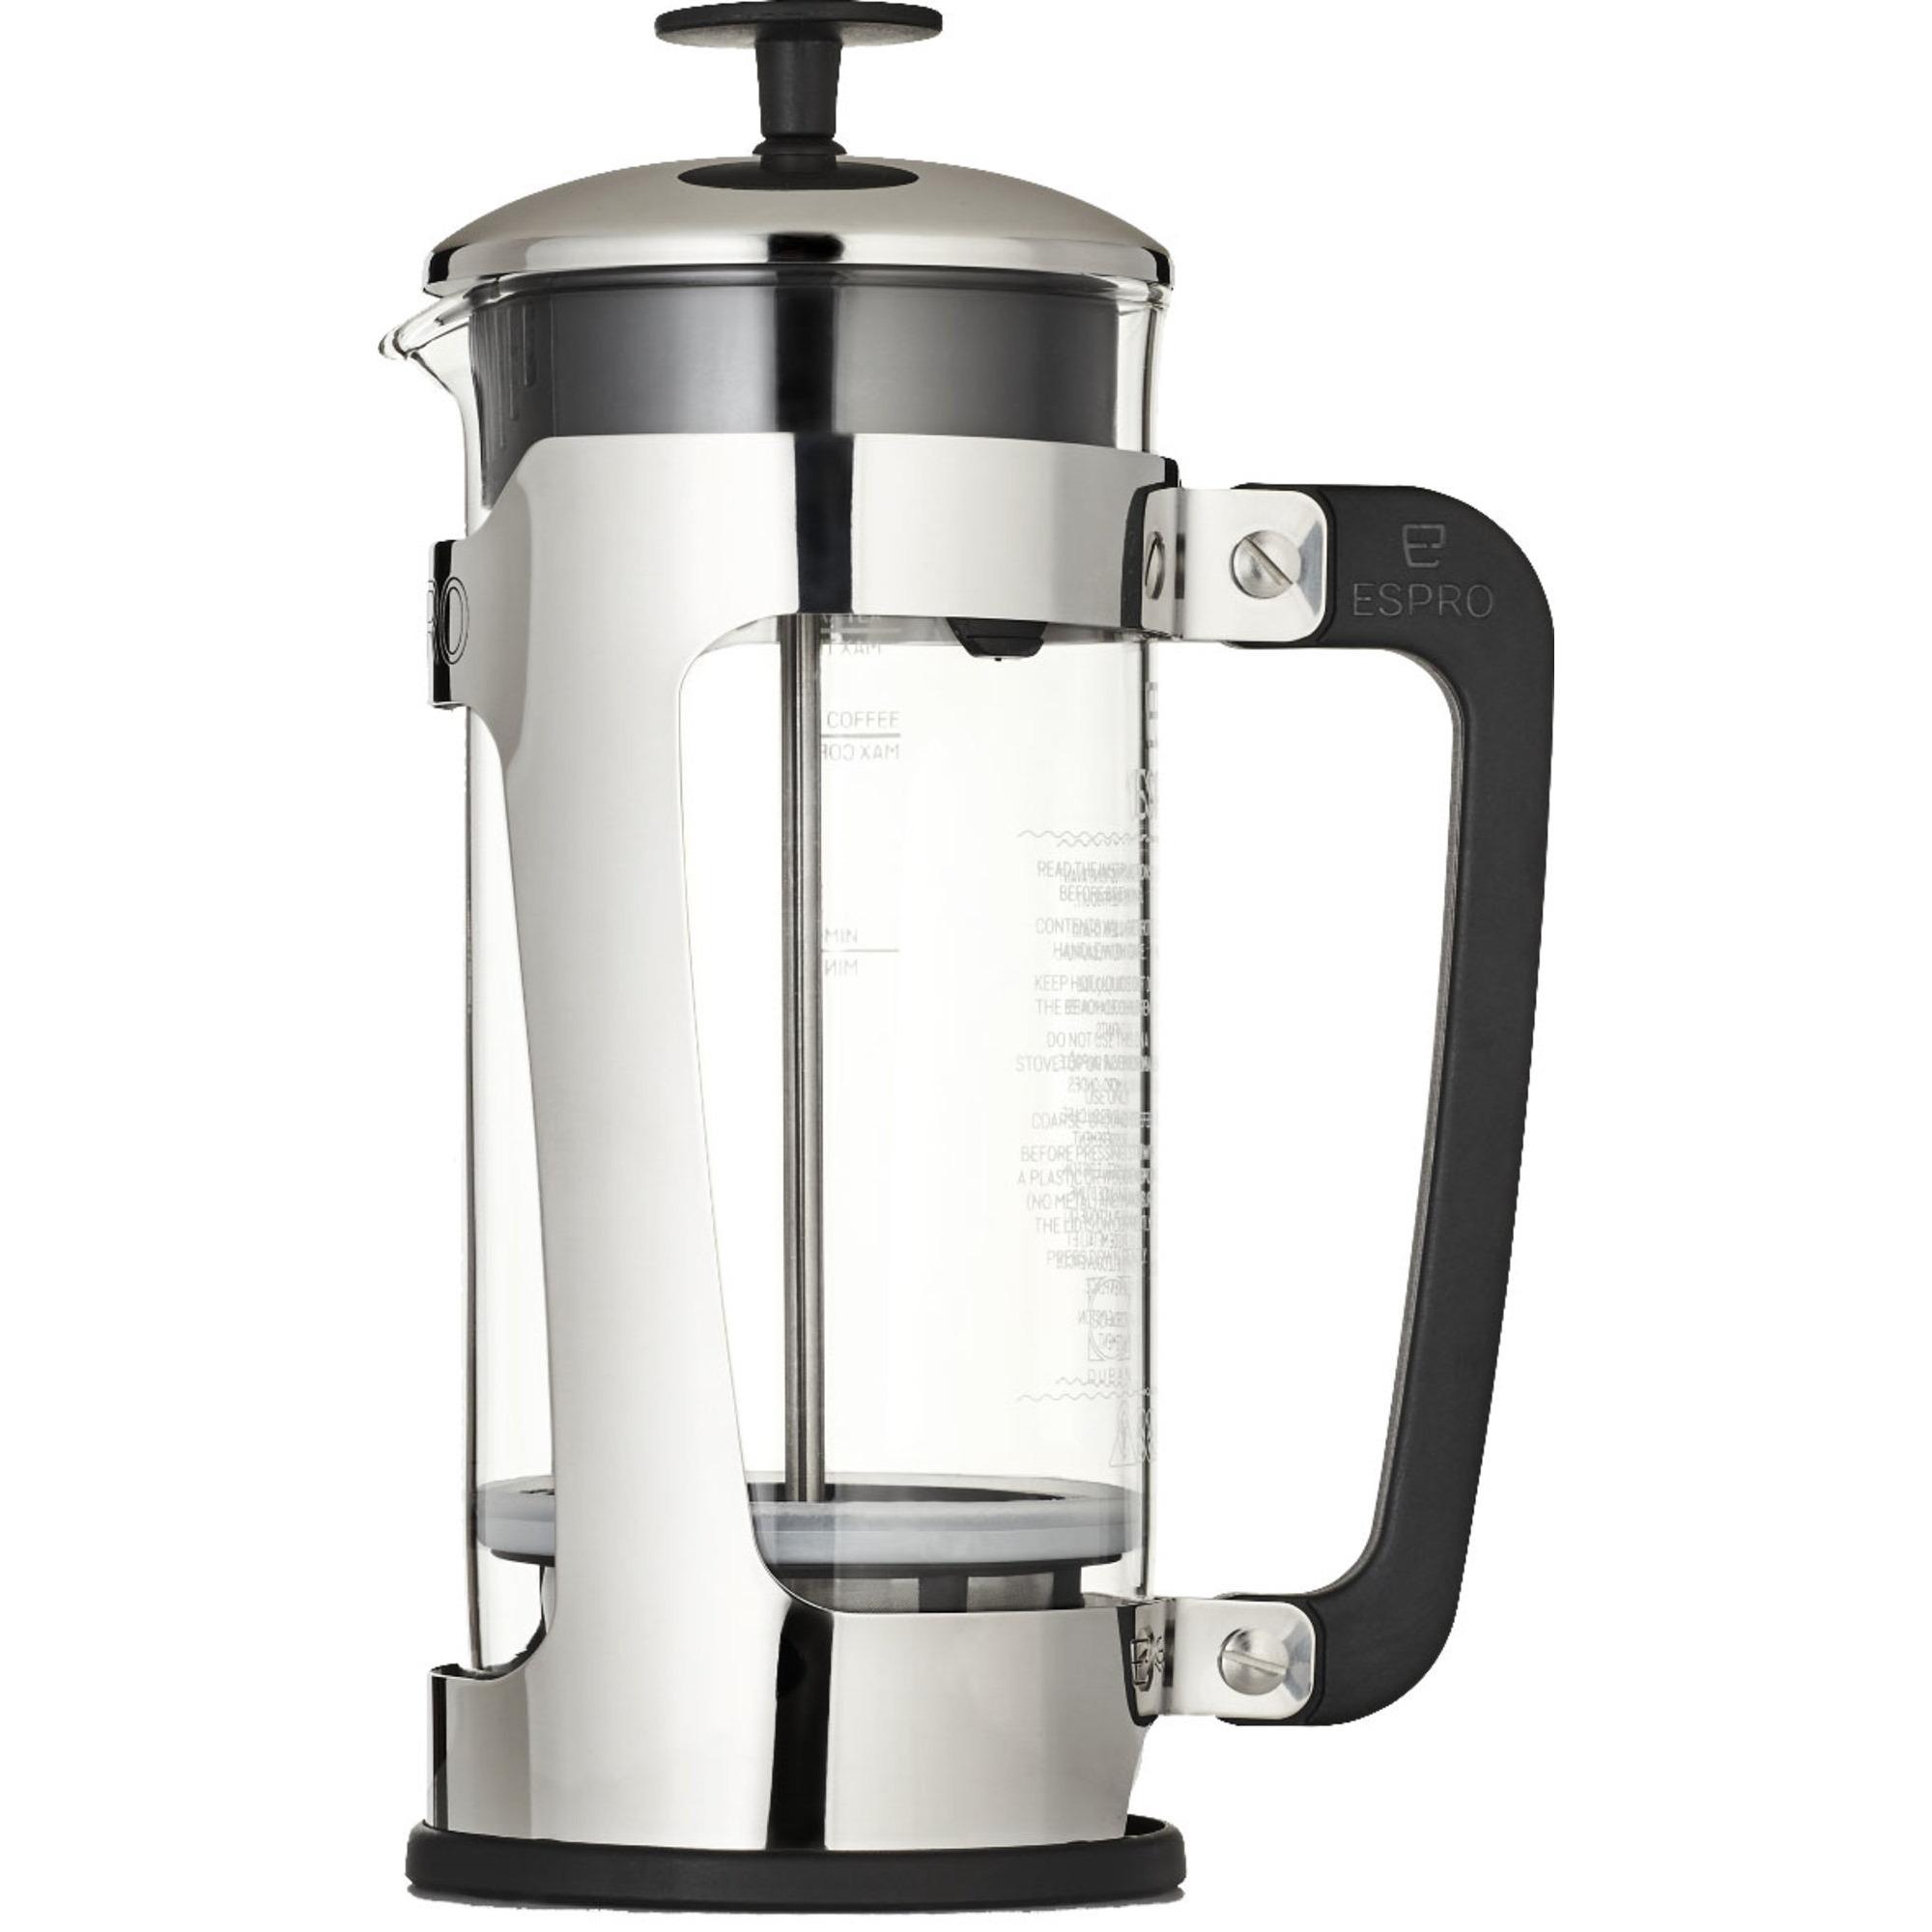 Espro P5 1232T kaffepress